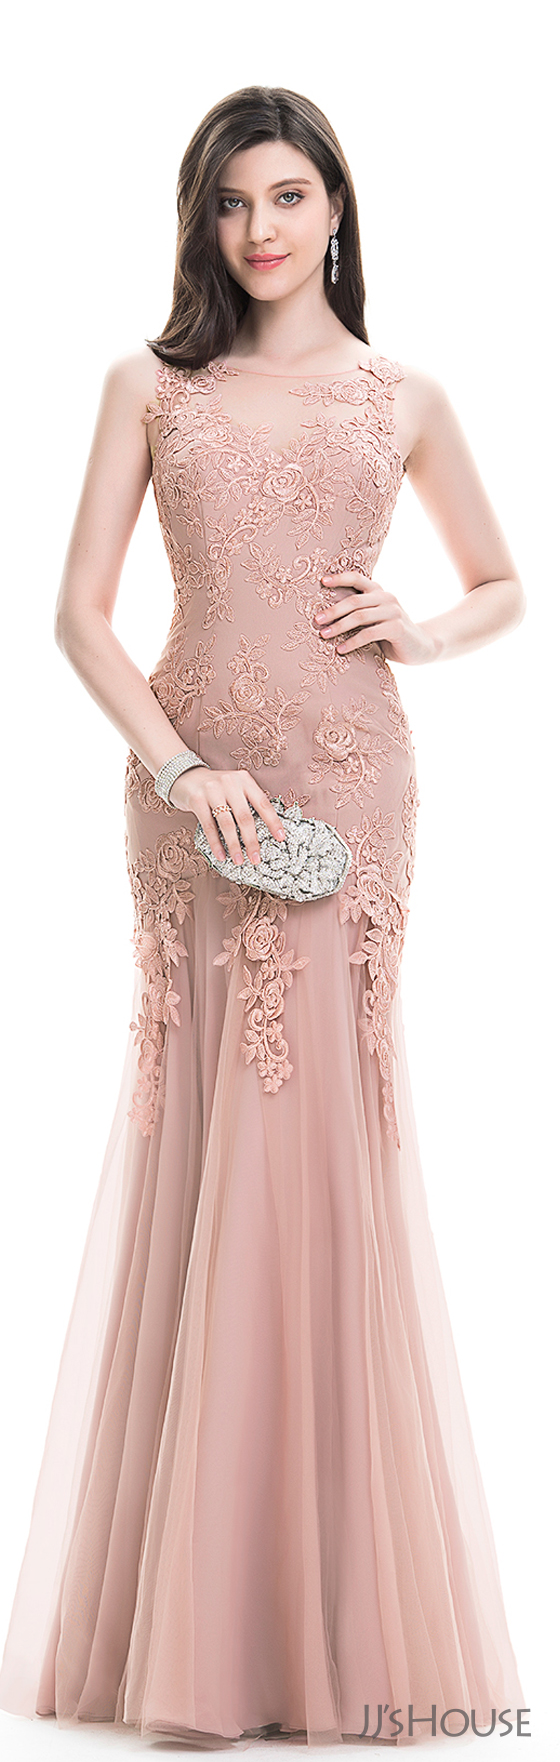 JJsHouse #Evening | Vestidos de noche | Pinterest | Gowns, Kebaya ...